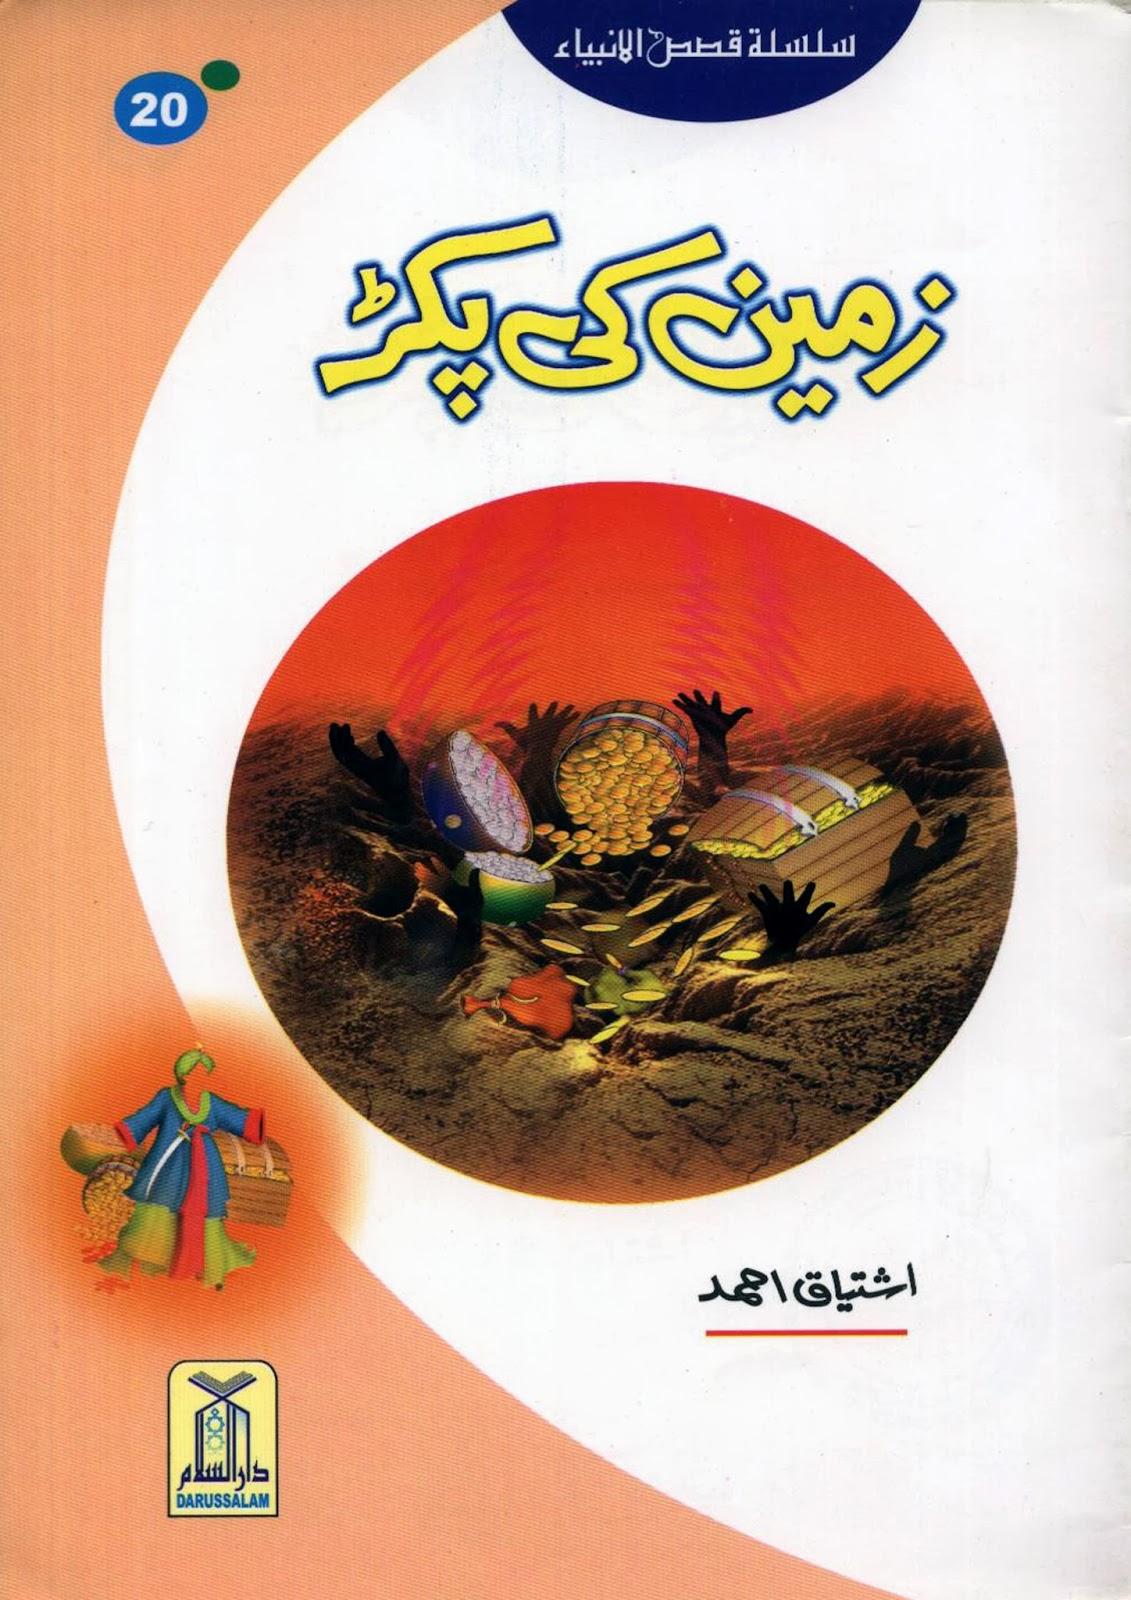 http://urduguru1.blogspot.com/2014/03/zameen-ki-pakarh-prophet-mussa-as.html